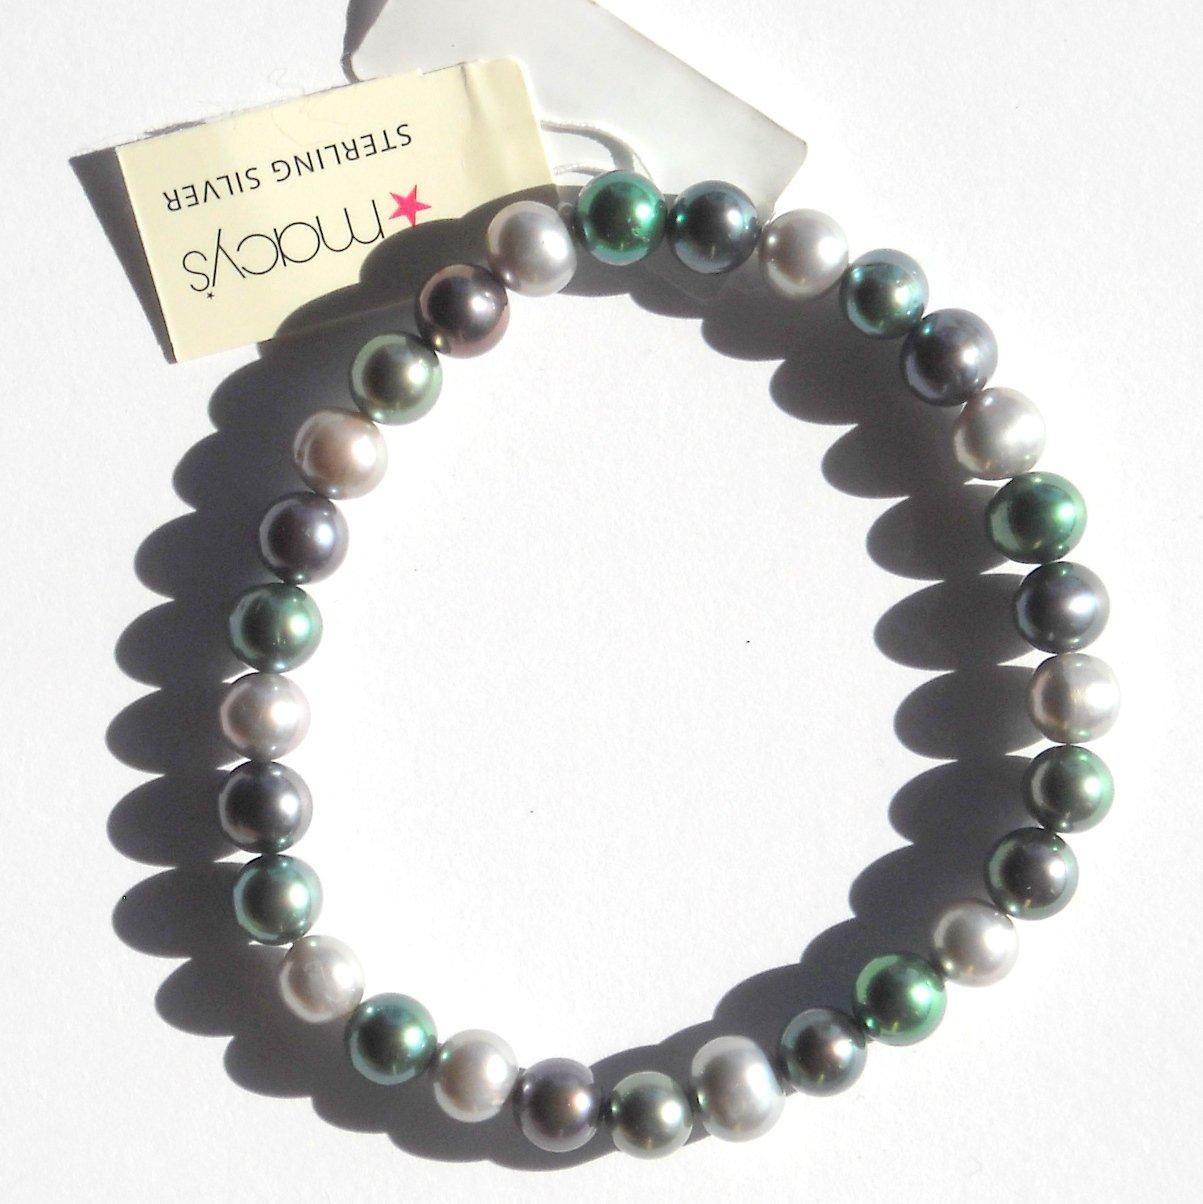 Macys Cultured Round Green Freshwater Pearl Strand Stretch Bracelet NWT